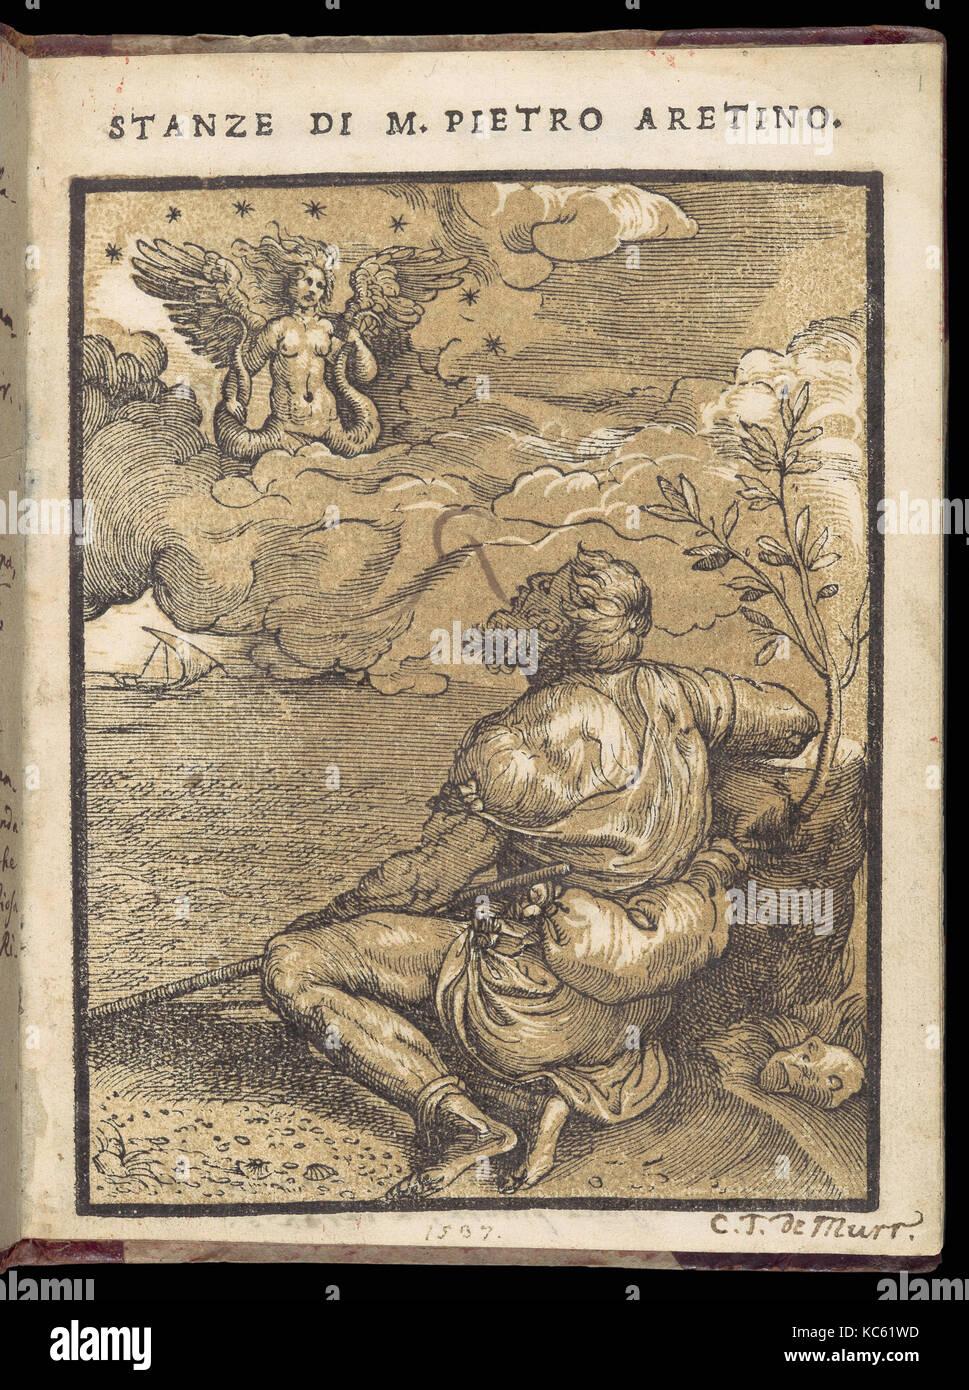 Stanze di m. Pietro Aretino, 23. Januar 1537, gedruckte Buch mit holzschnitt Abbildungen, 7 5/8 x 5 13/16 x 5/16 Stockbild